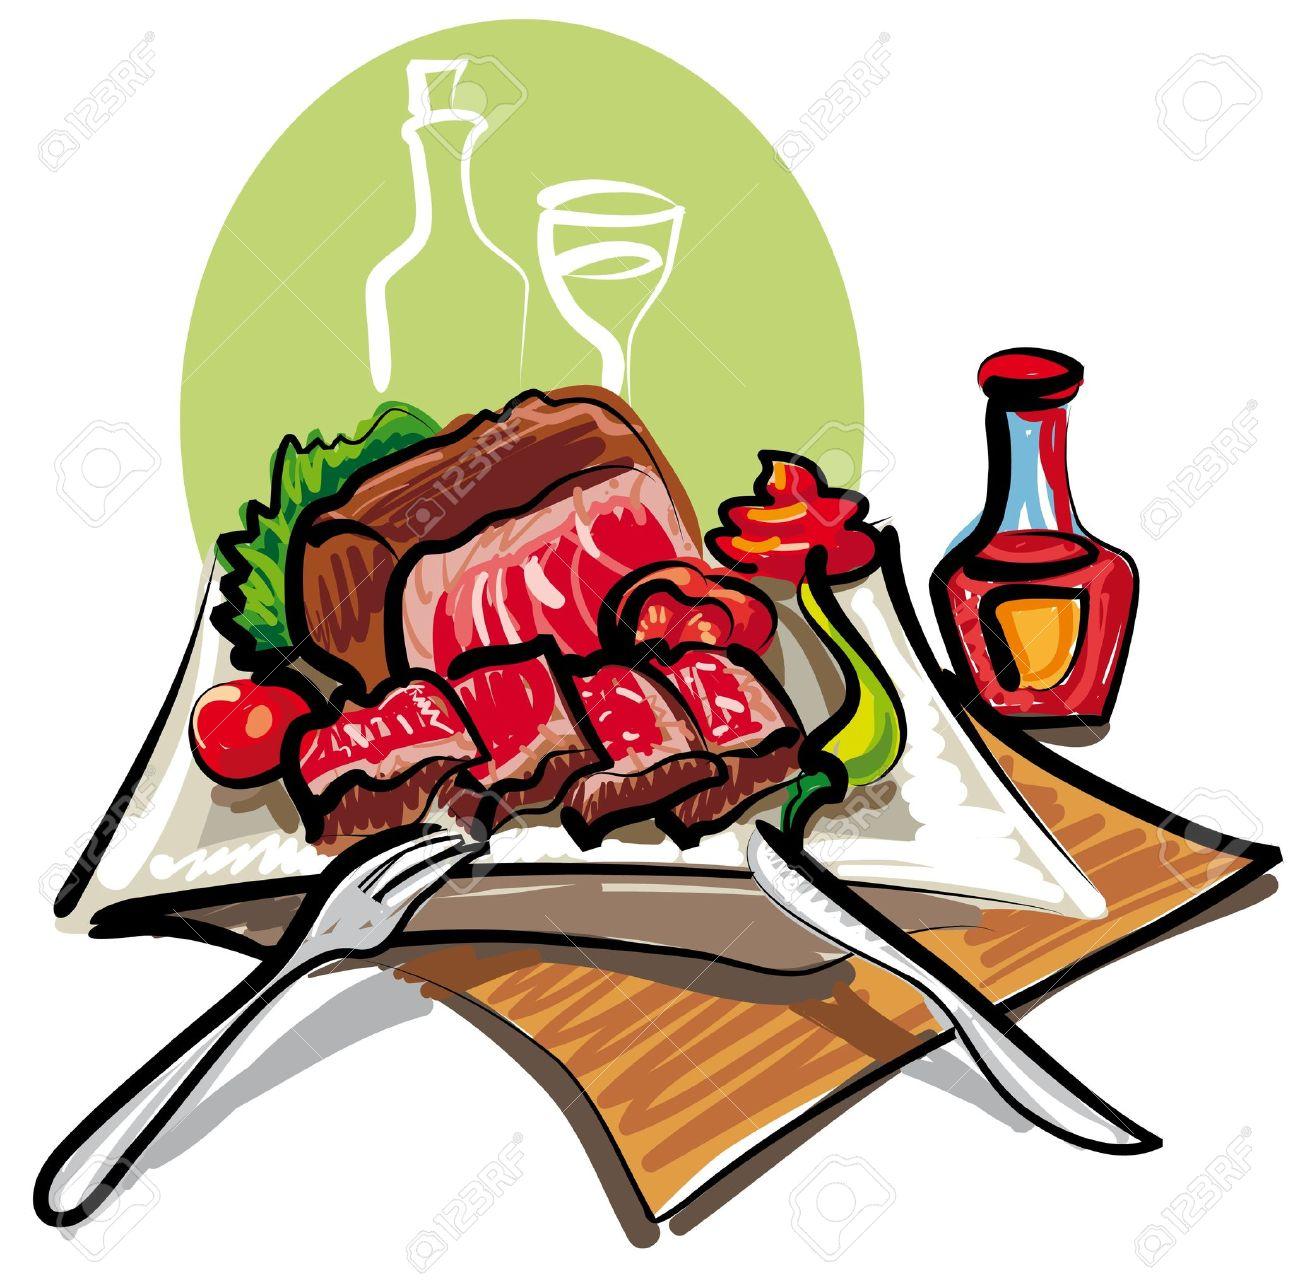 Baked steak dinner clipart free jpg black and white download Cooked Steak Clipart | Free download best Cooked Steak Clipart on ... jpg black and white download